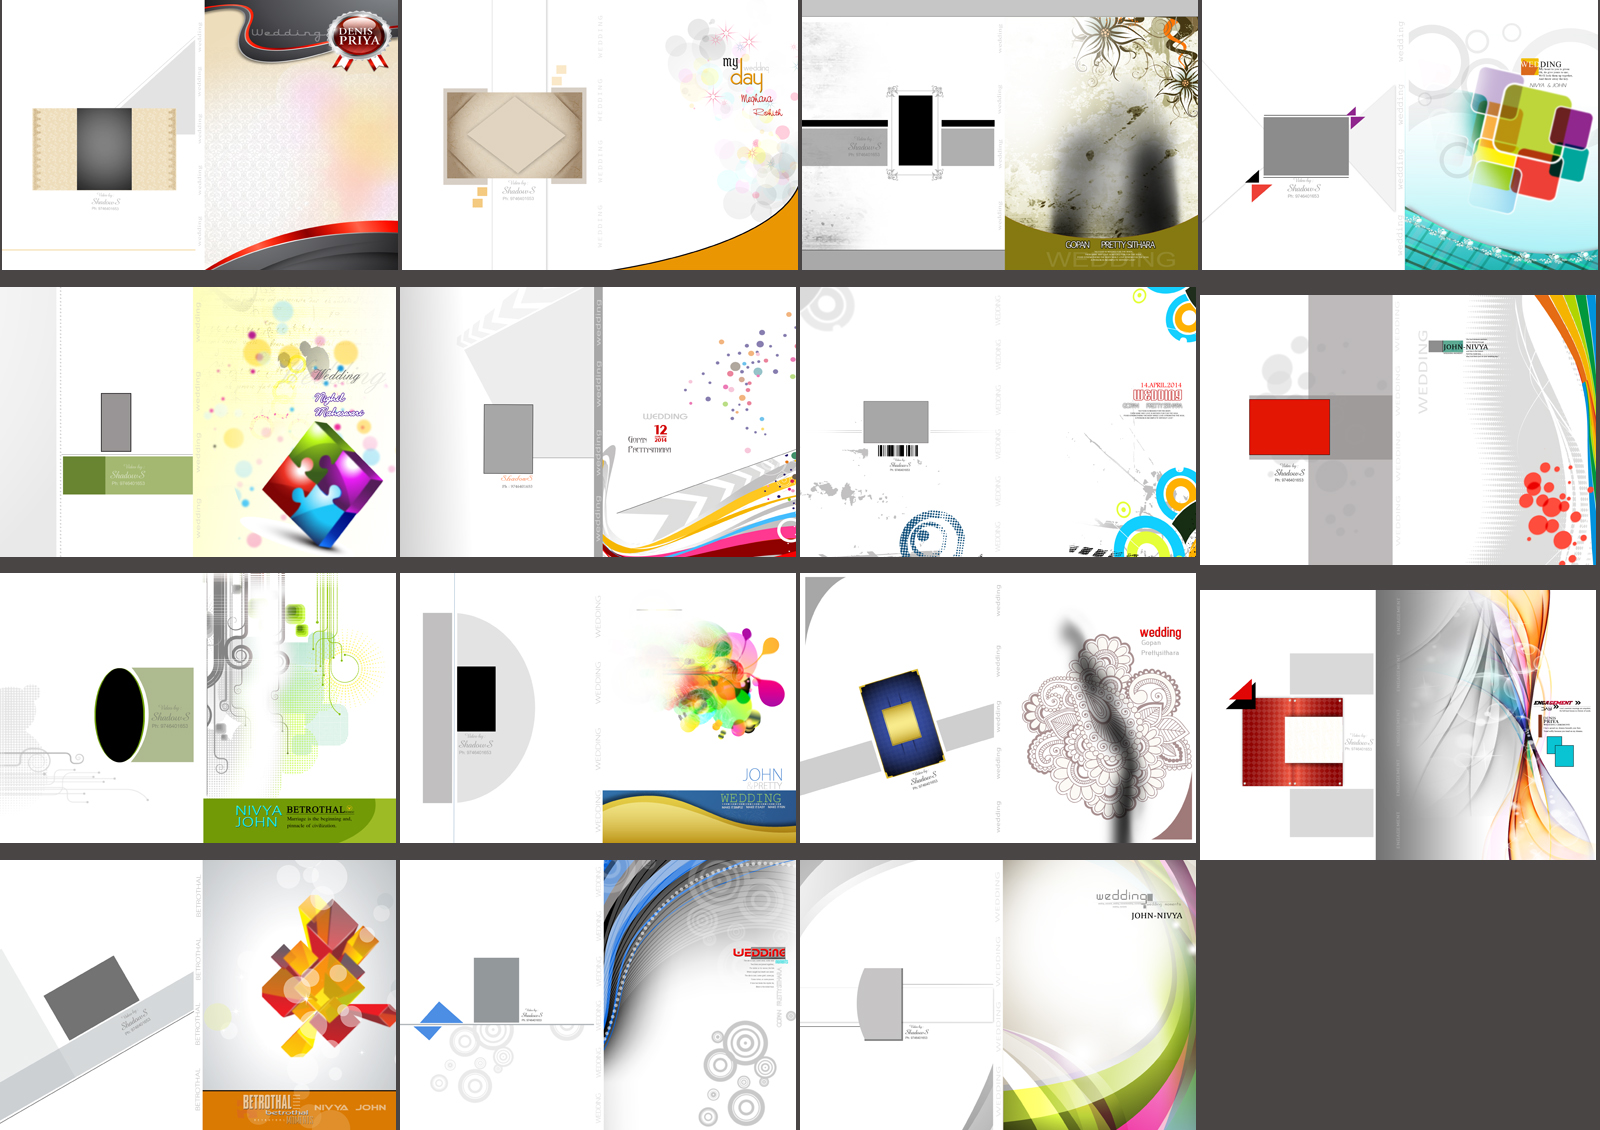 Wedding Album DVD Cover Design 12×18 PSD Templates